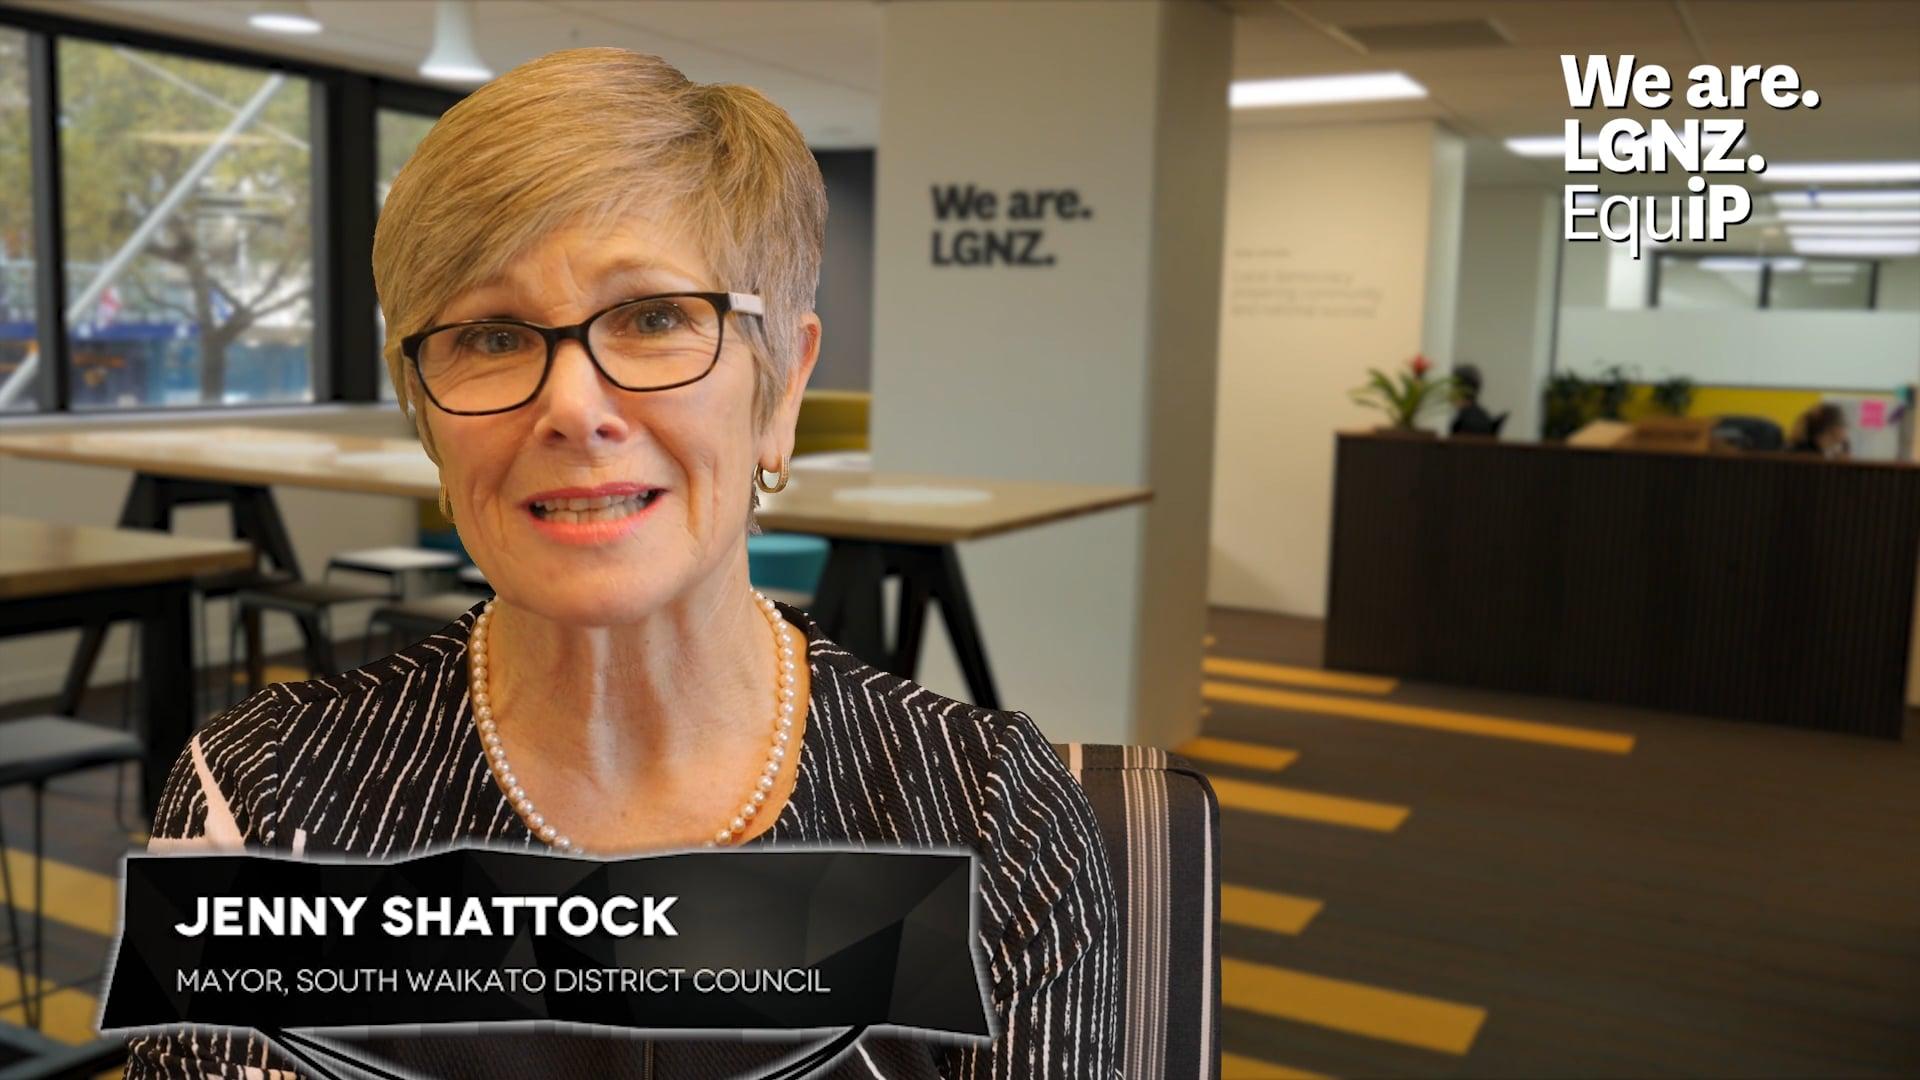 Benefits of Professional Development - Jenny Shattock